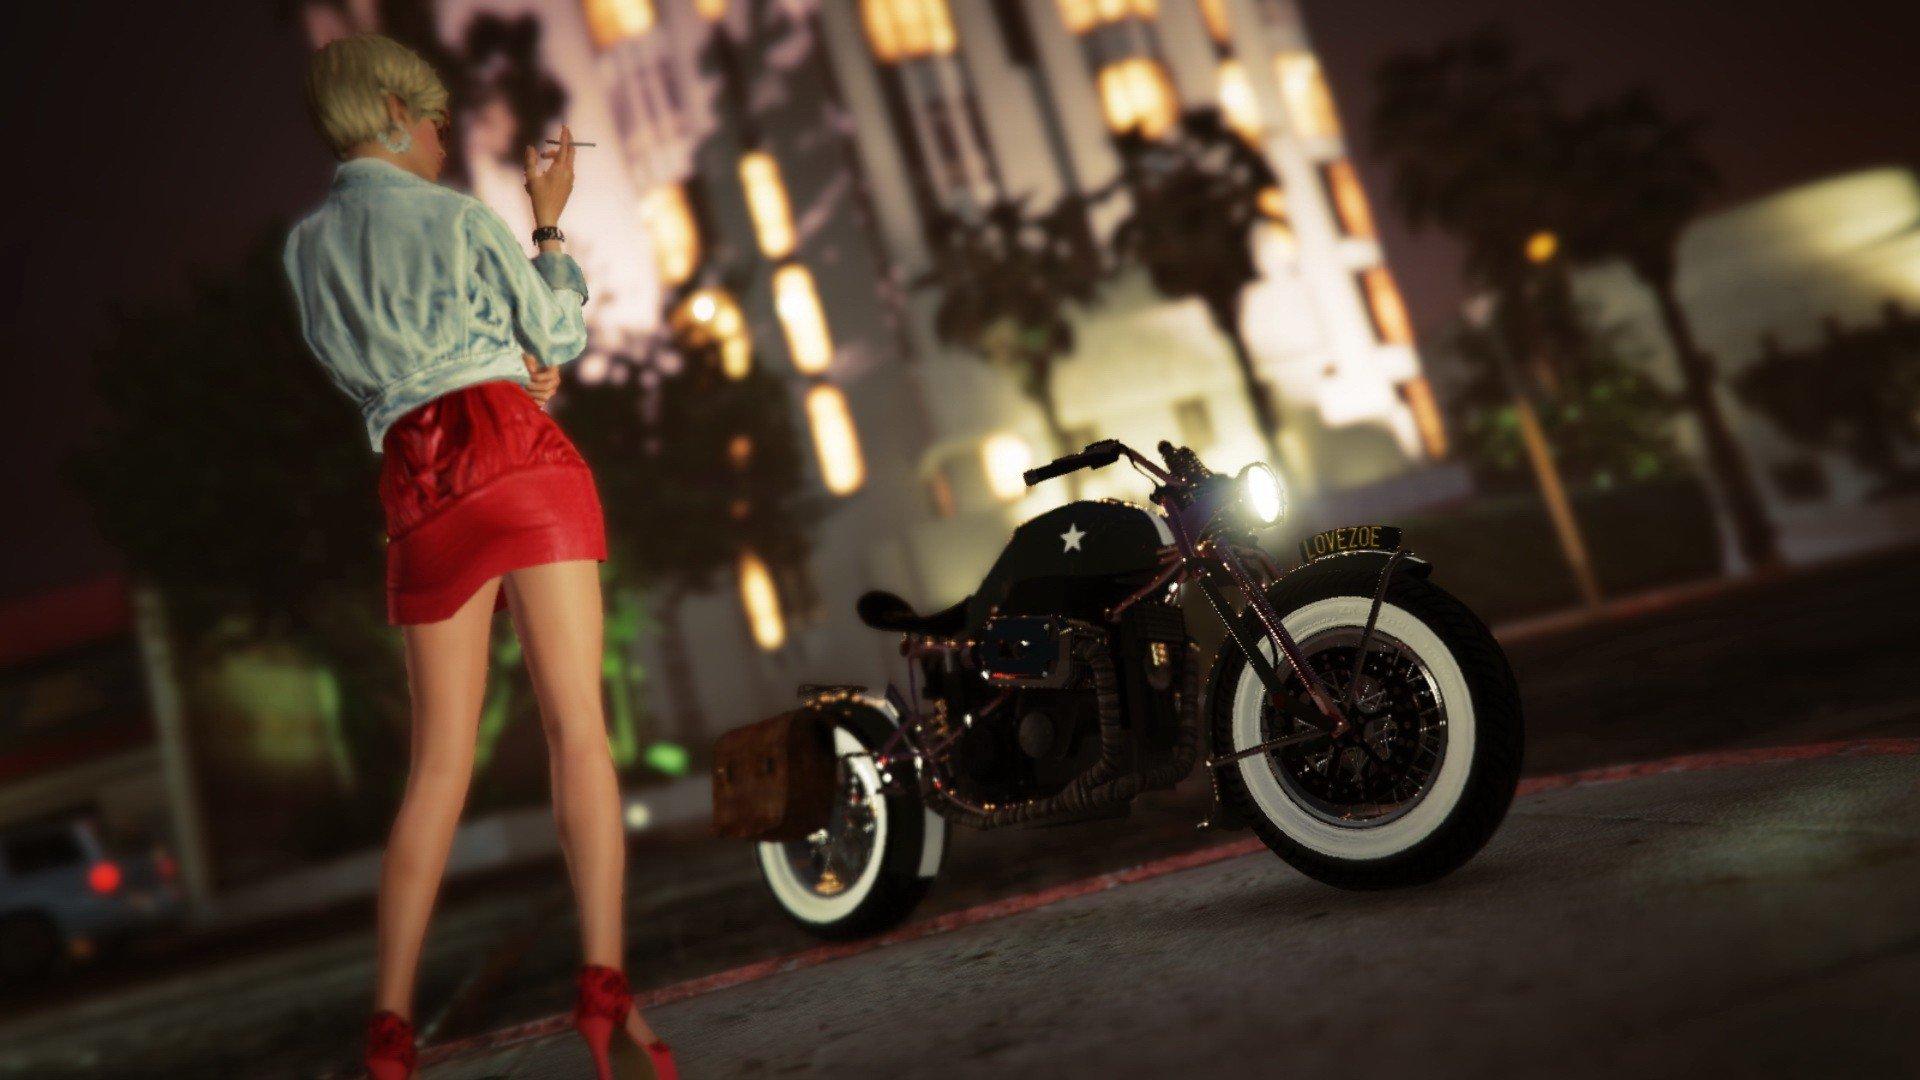 Ipad Retina Hd Wallpaper Rockstar Games: Grand Theft Auto V, Grand Theft Auto Online, Rockstar